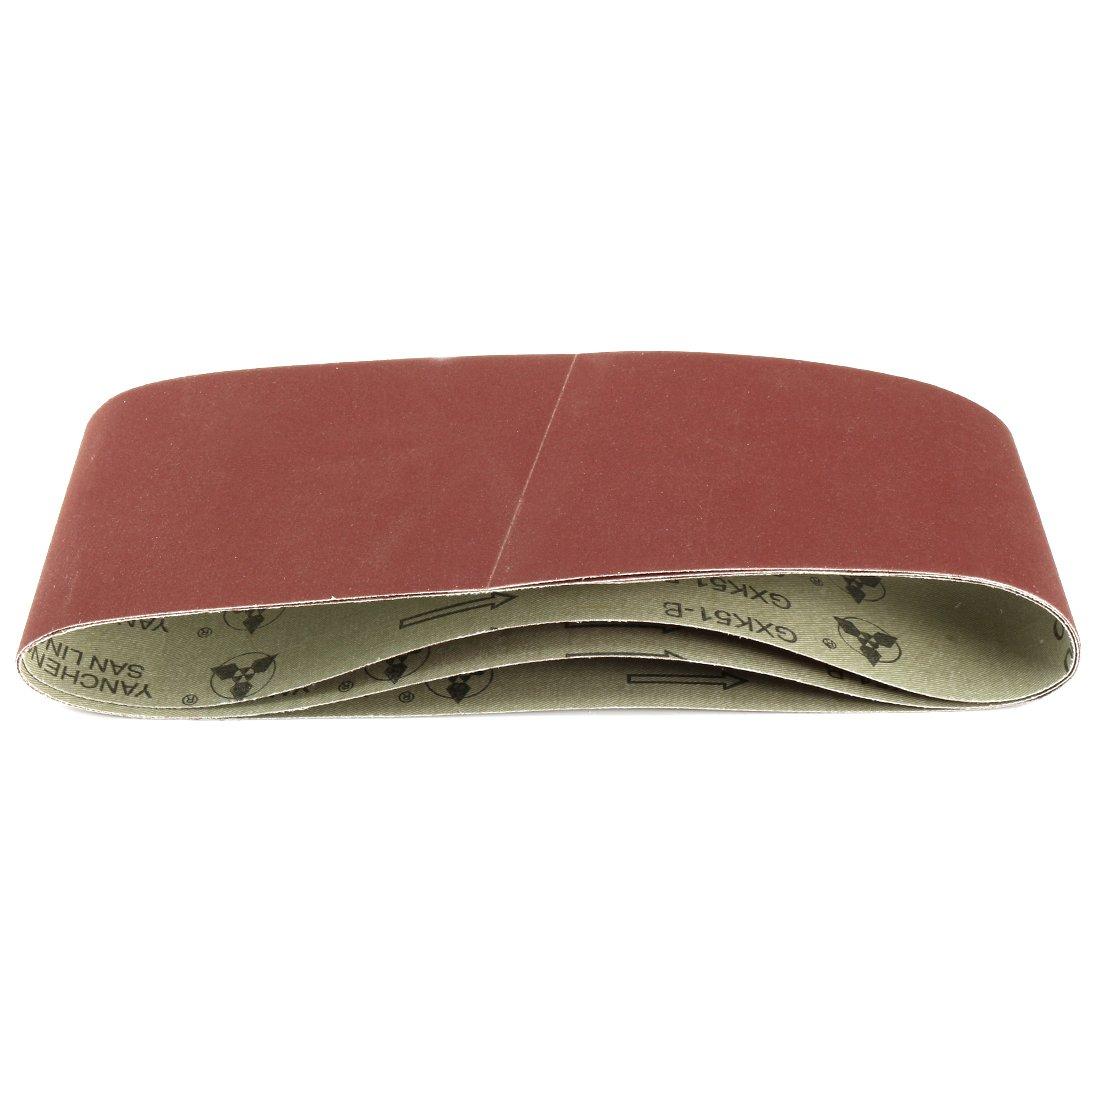 uxcell 3-Inch x 21-Inch 600 Grit Tape Joint Aluminum Oxide Sanding Belt 3pcs